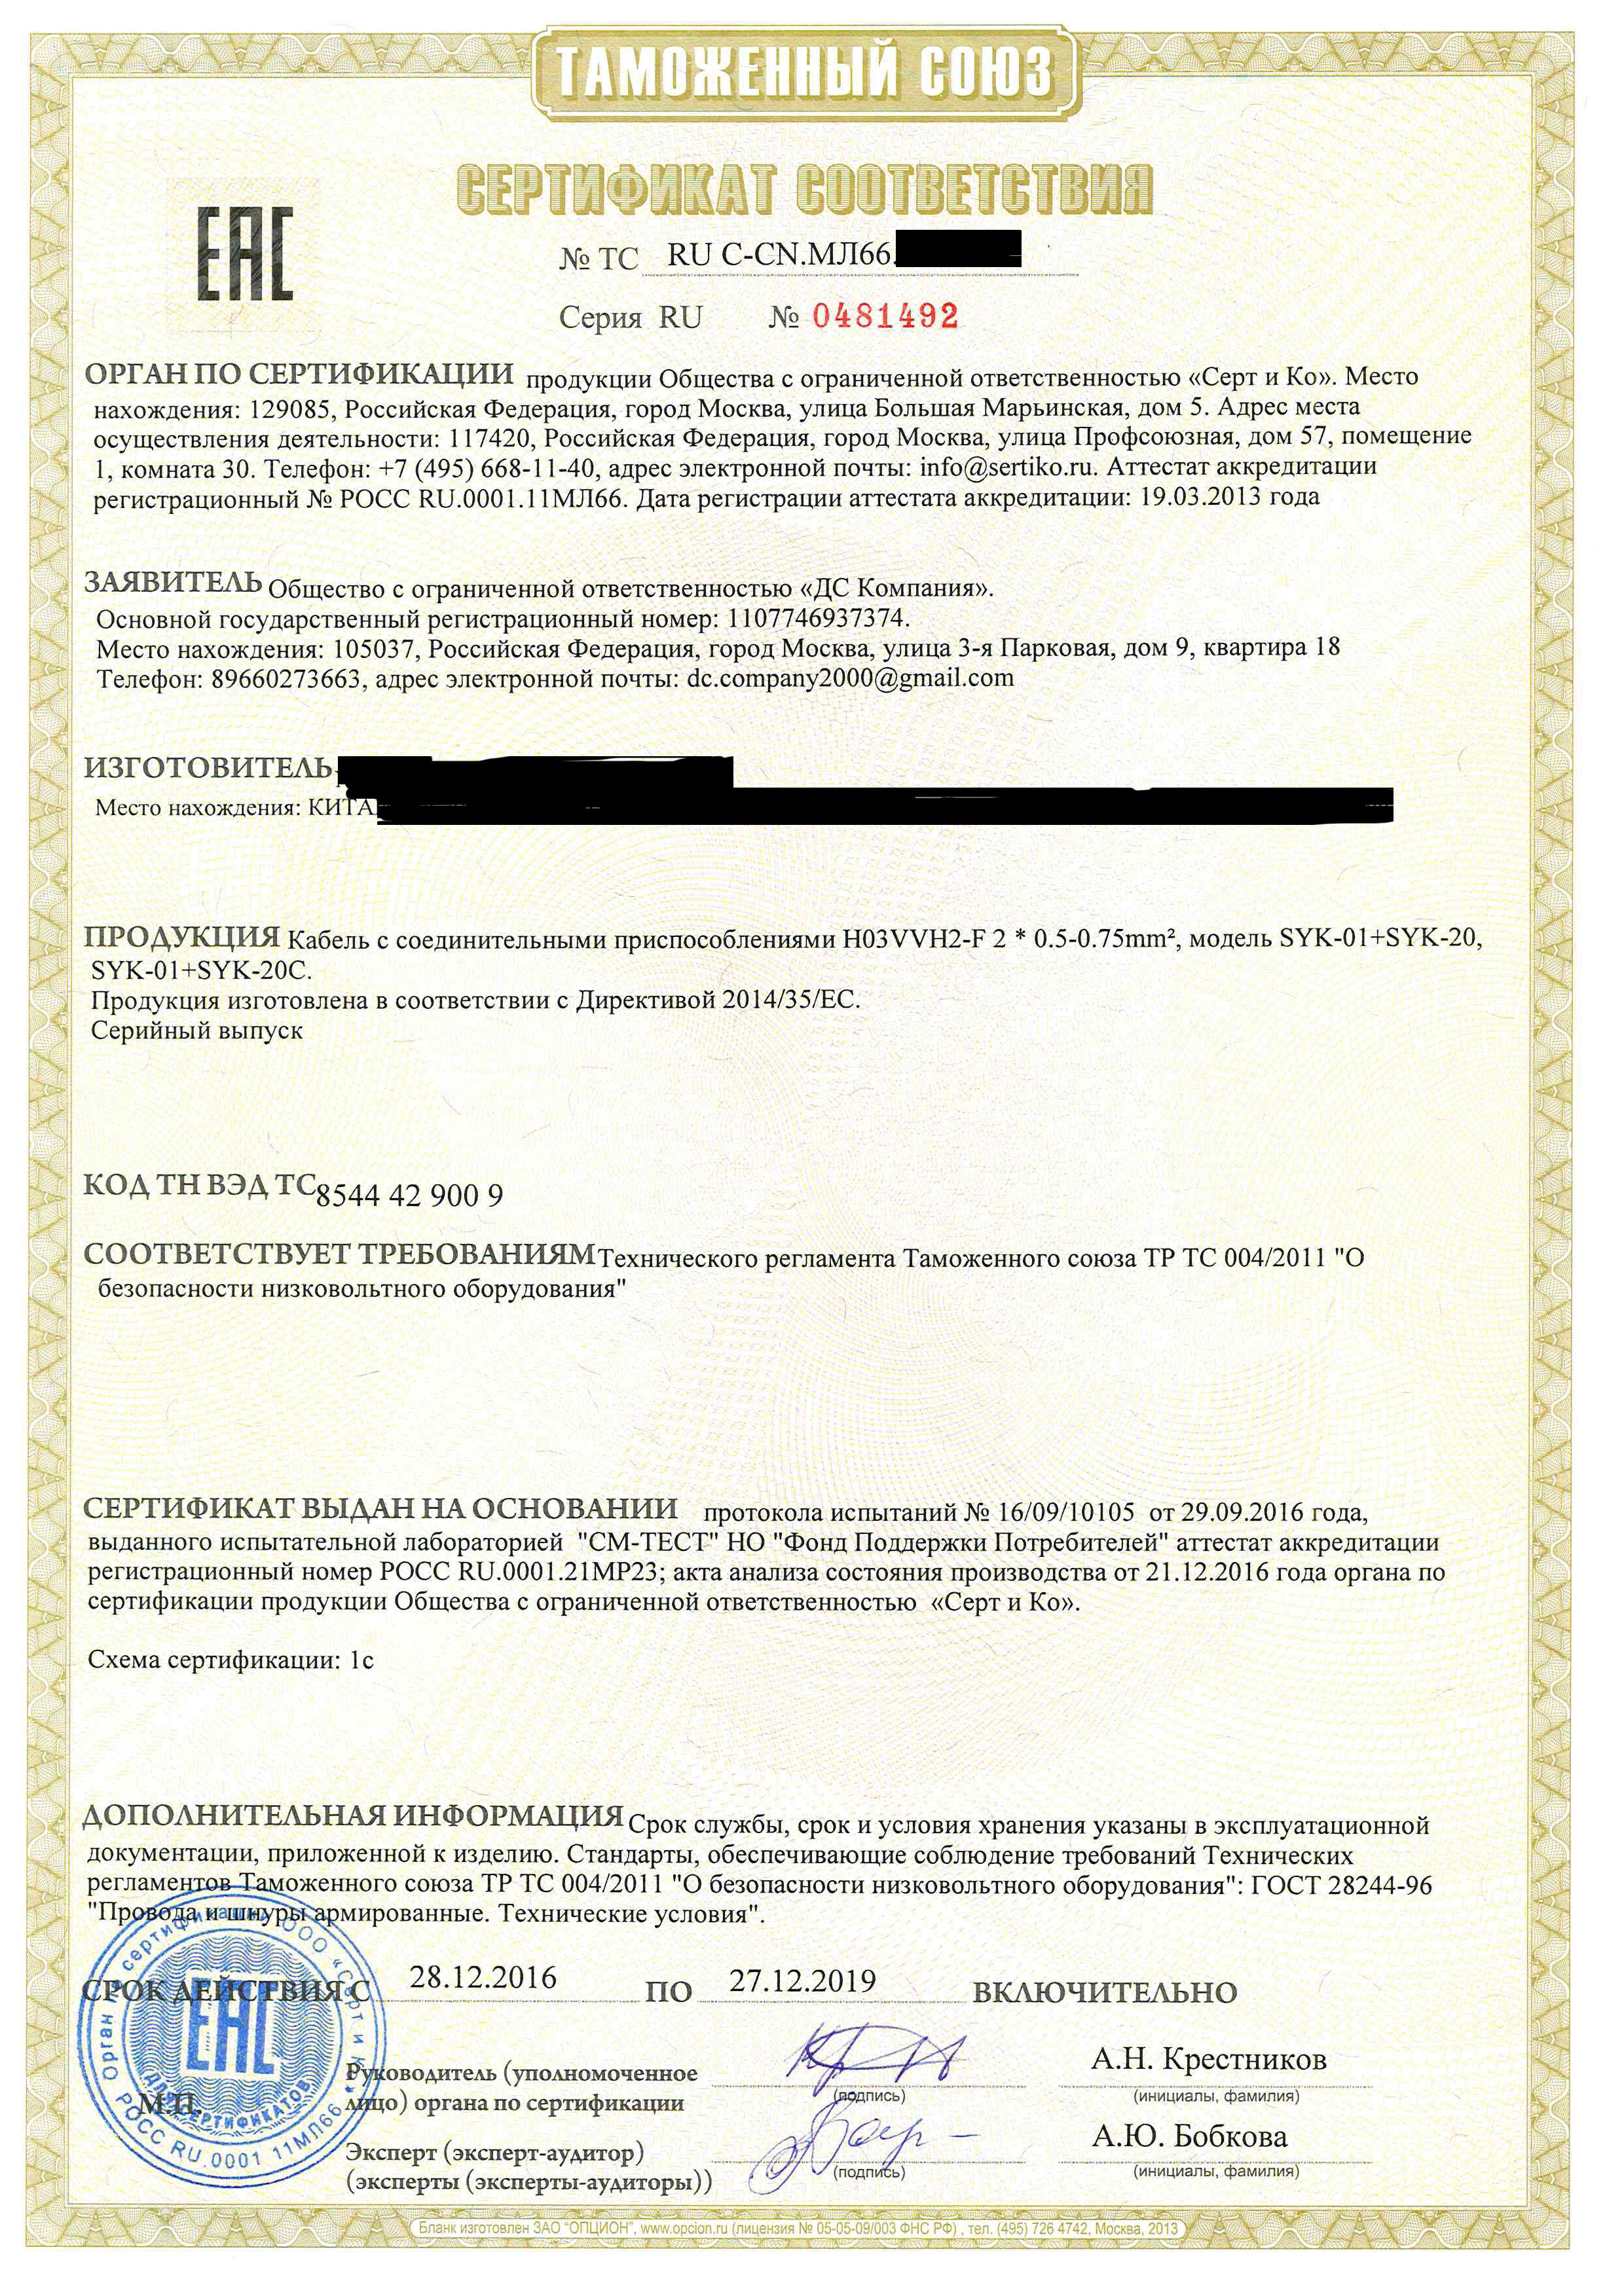 Сертификация по правилам таможенного союза сертификация microsoft ташкент